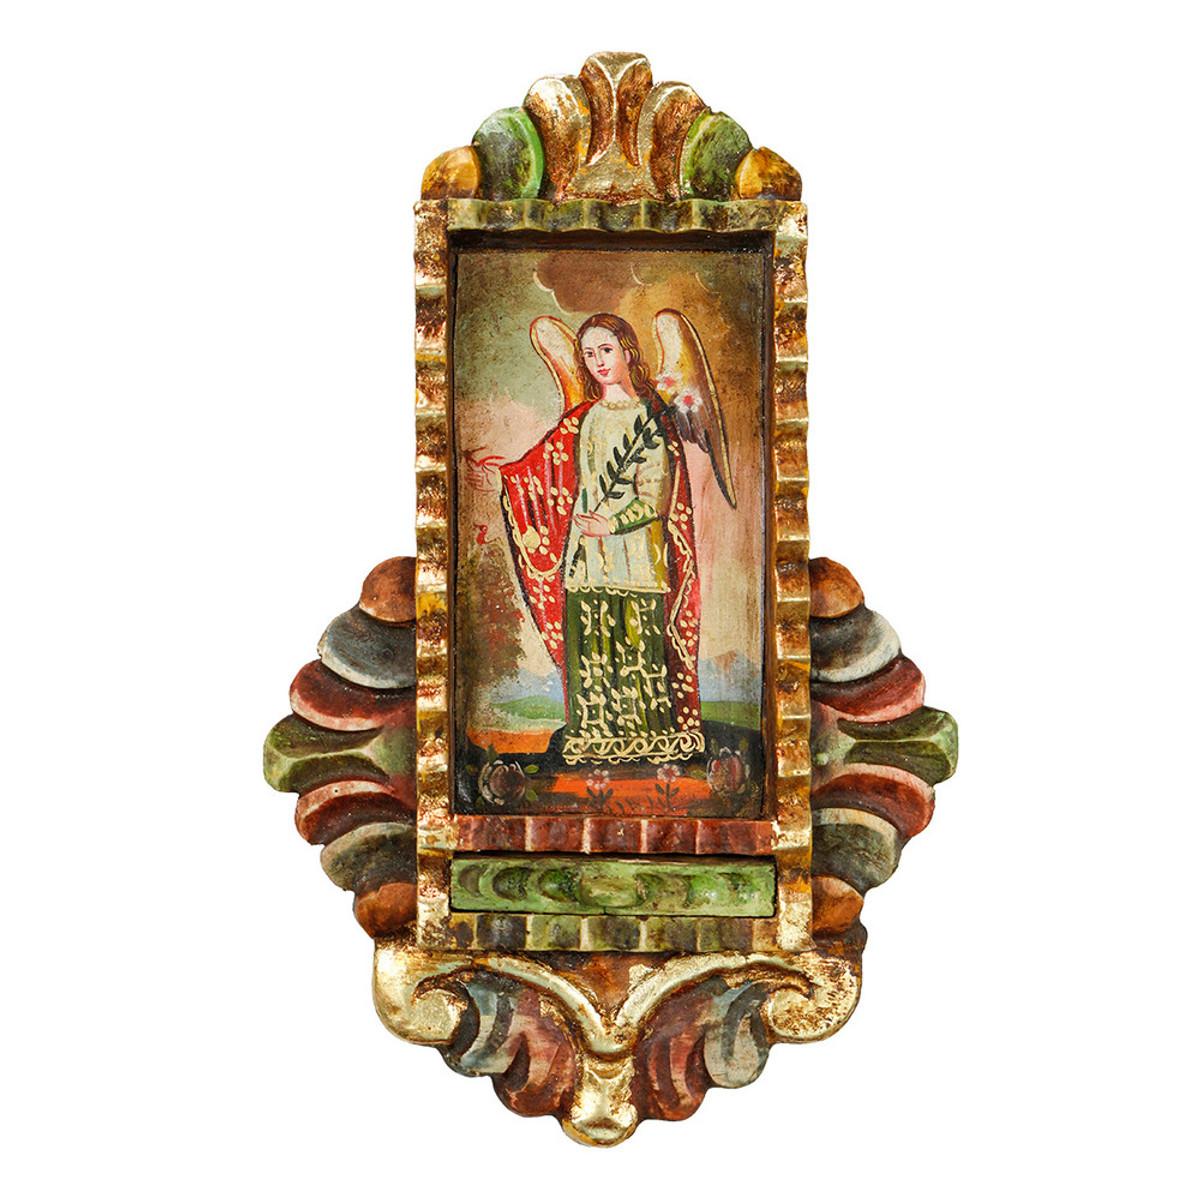 Archangel Gabriel - Colonial Cuzco Peru Handmade Retablo Folk Art Framed  Oil Painting on Canvas Hand Carved Wood Altarpiece